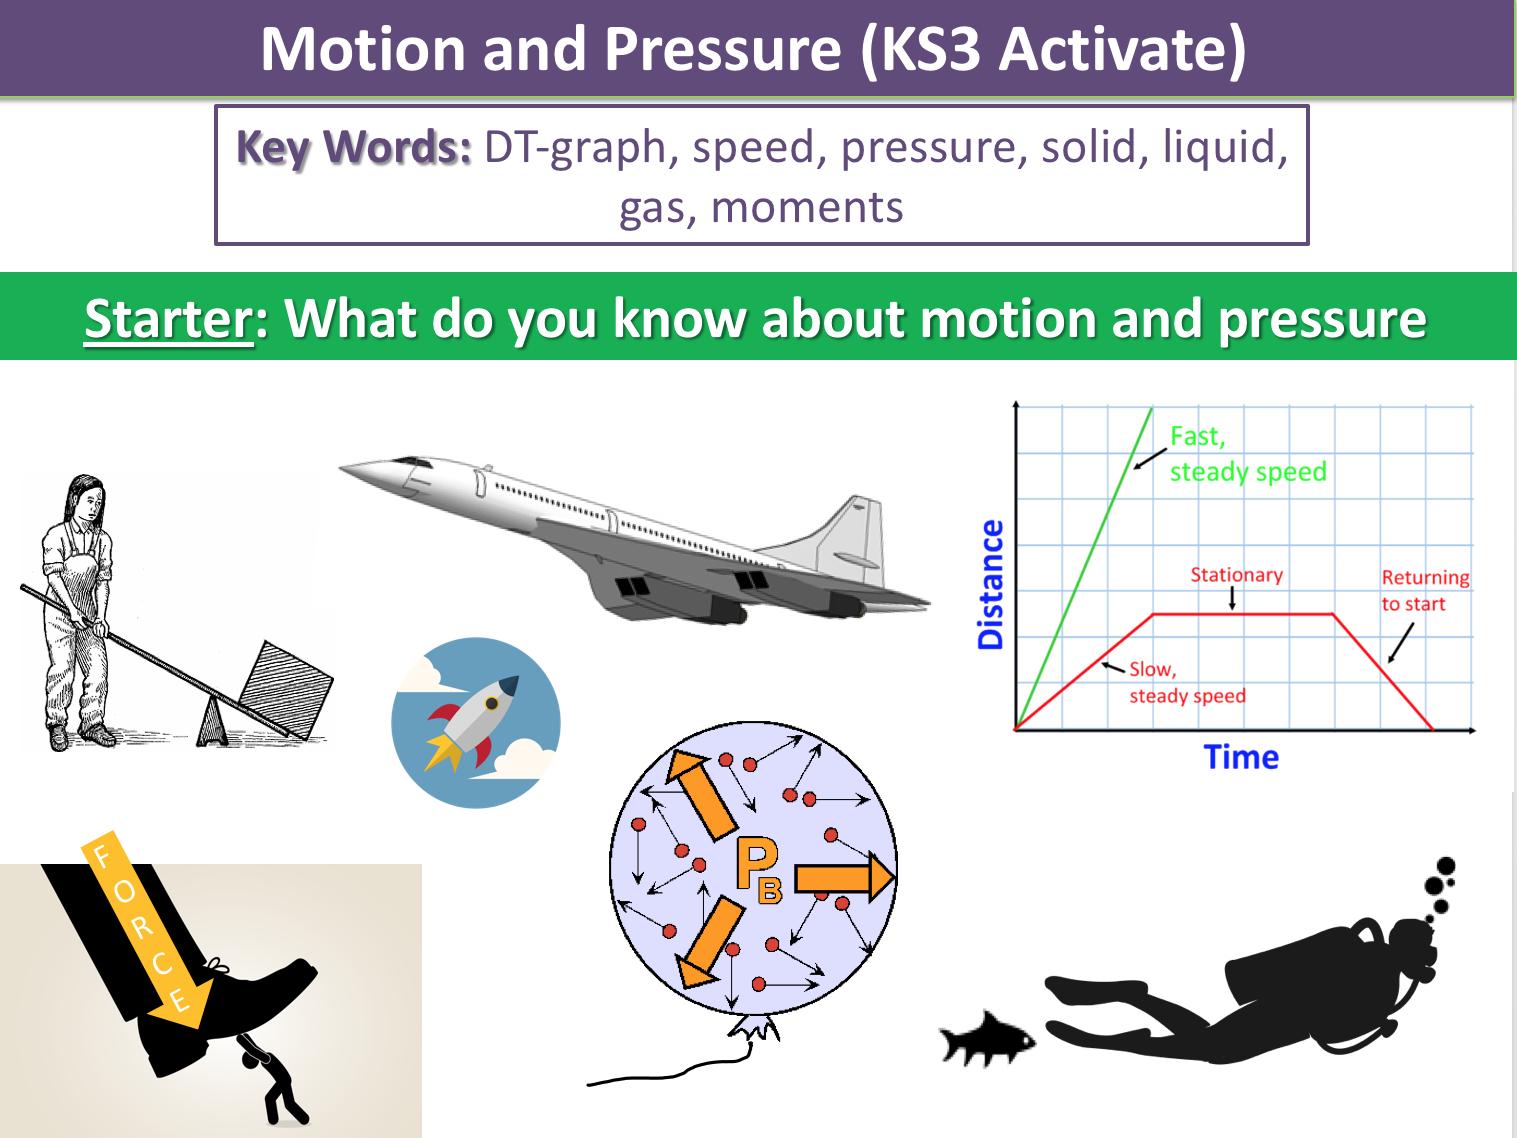 Motion and Pressure (KS3)